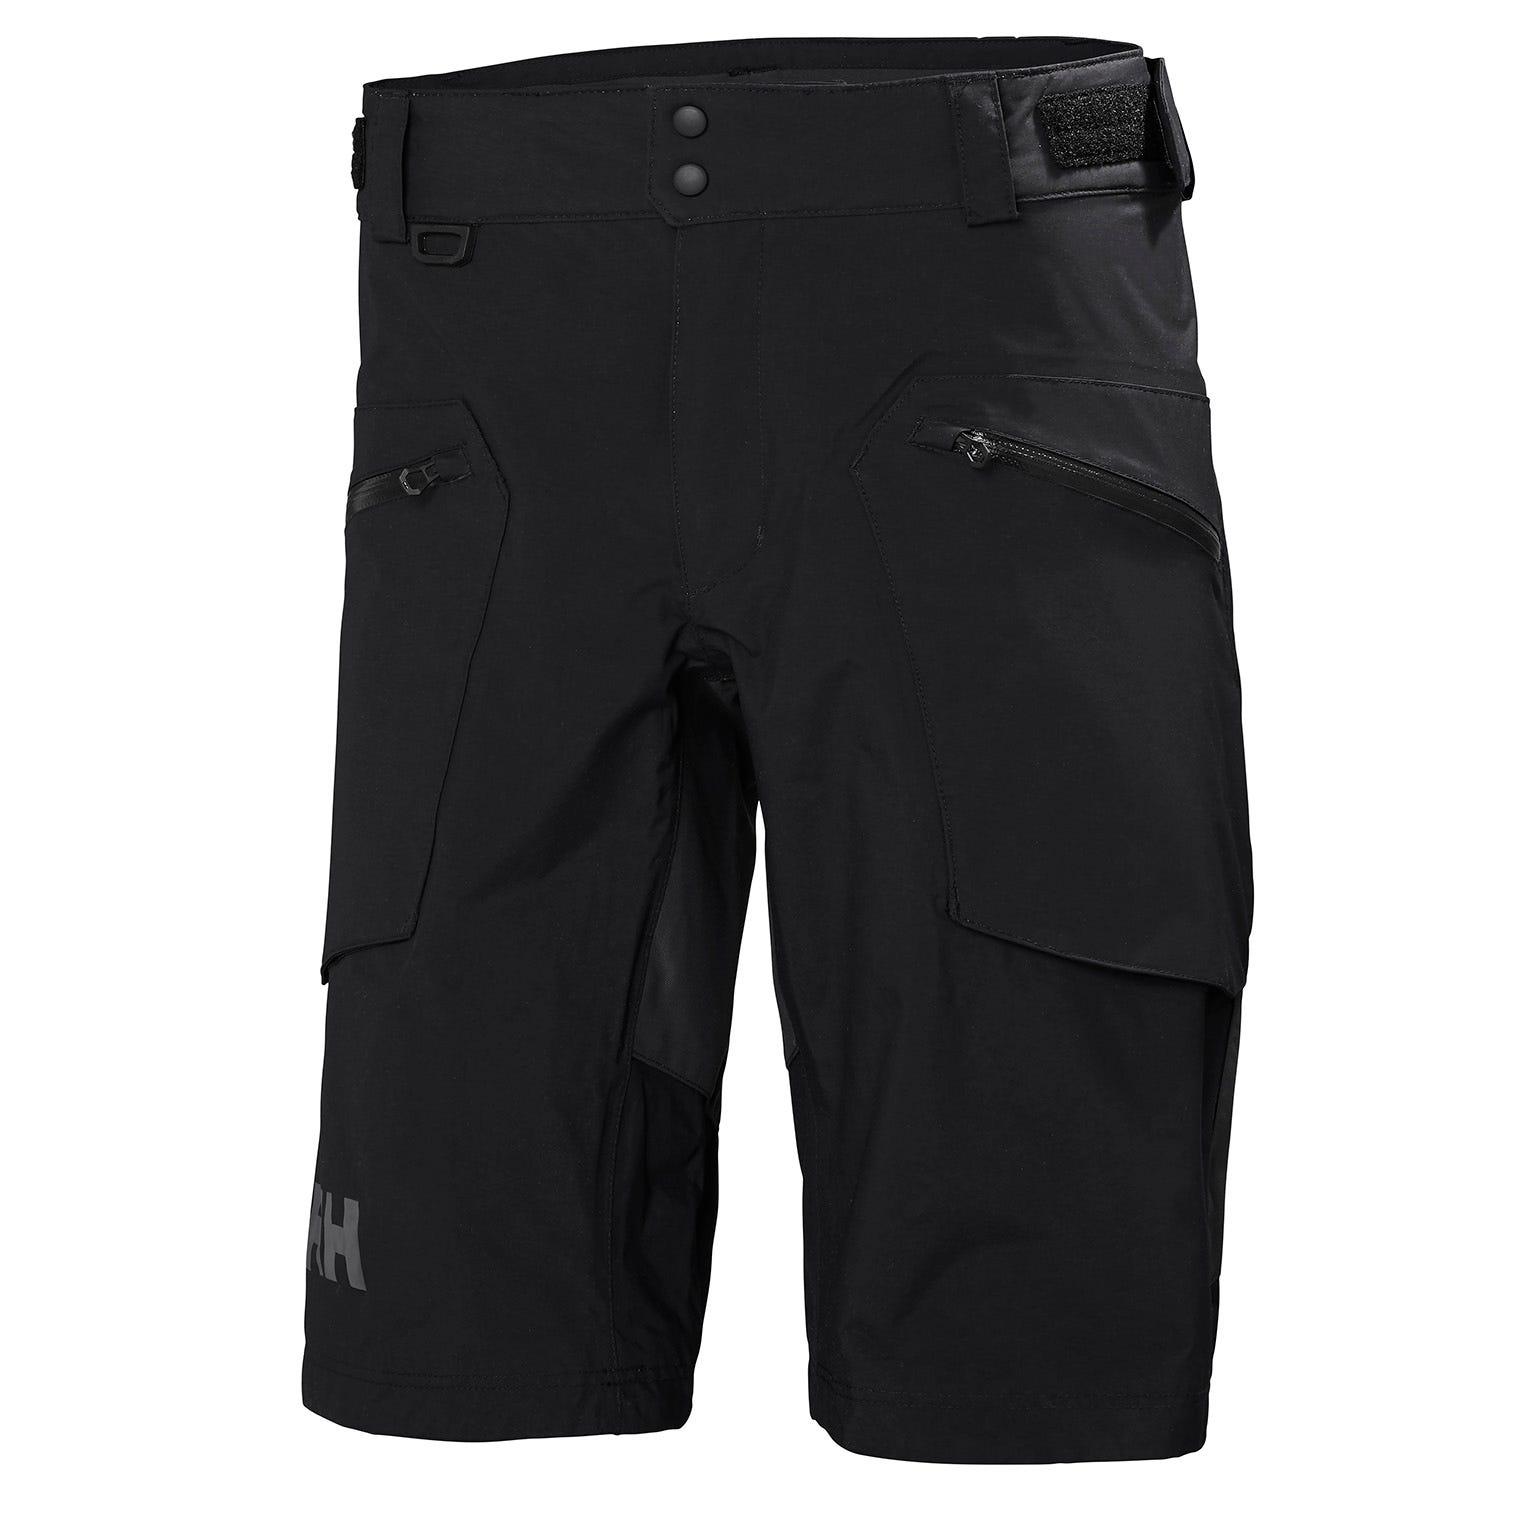 Helly Hansen Mens Hp Foil Ht Shorts Sailing Trouser Black L